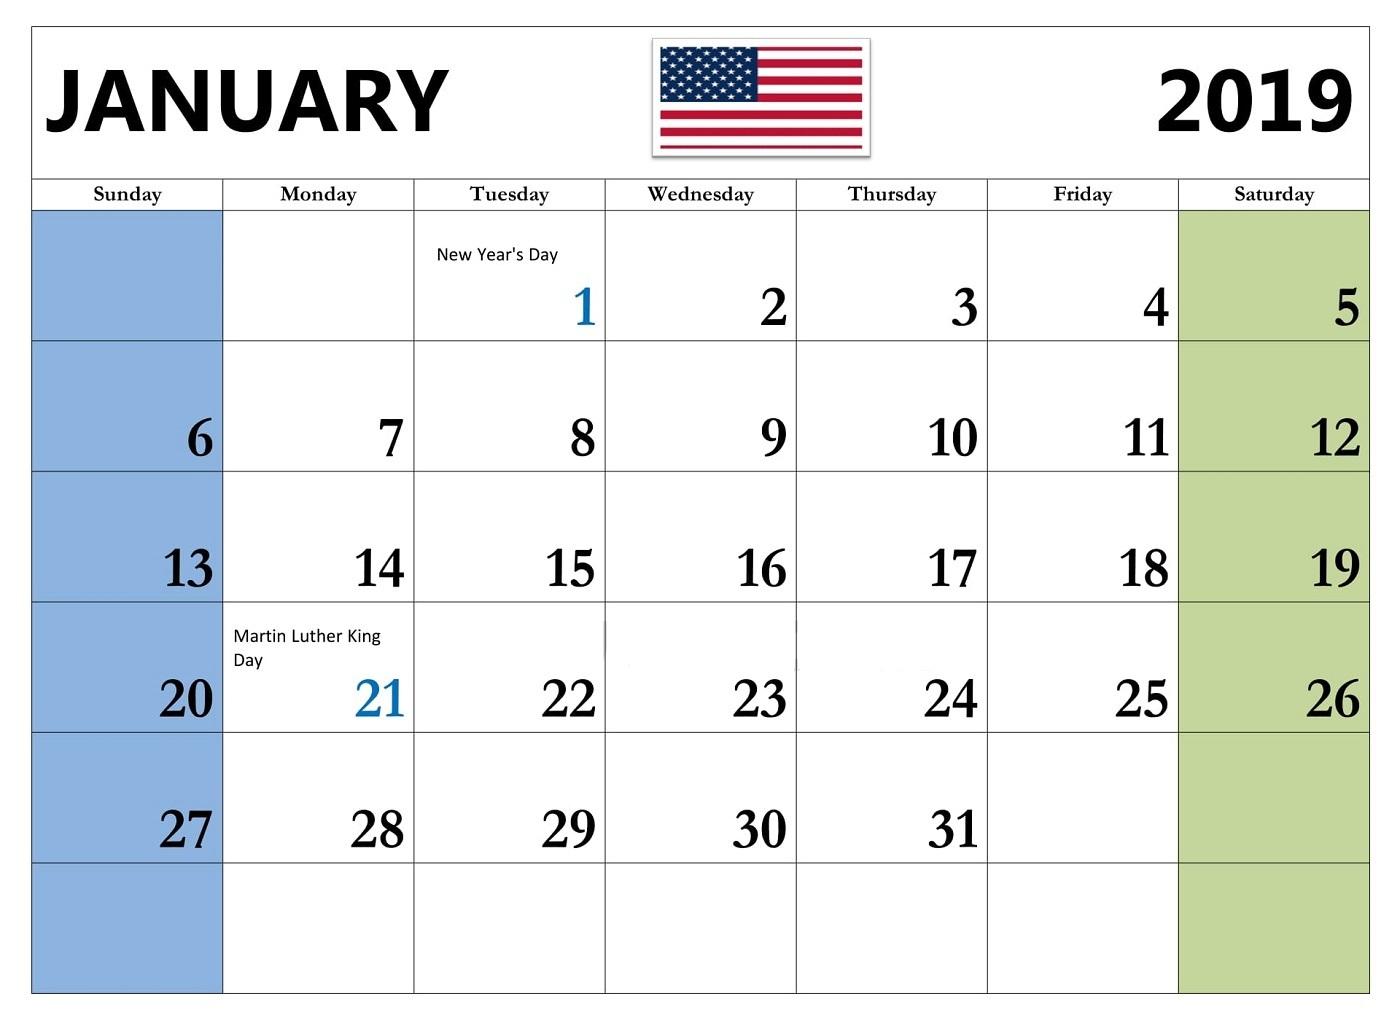 January Calendar 2019 With Holidays